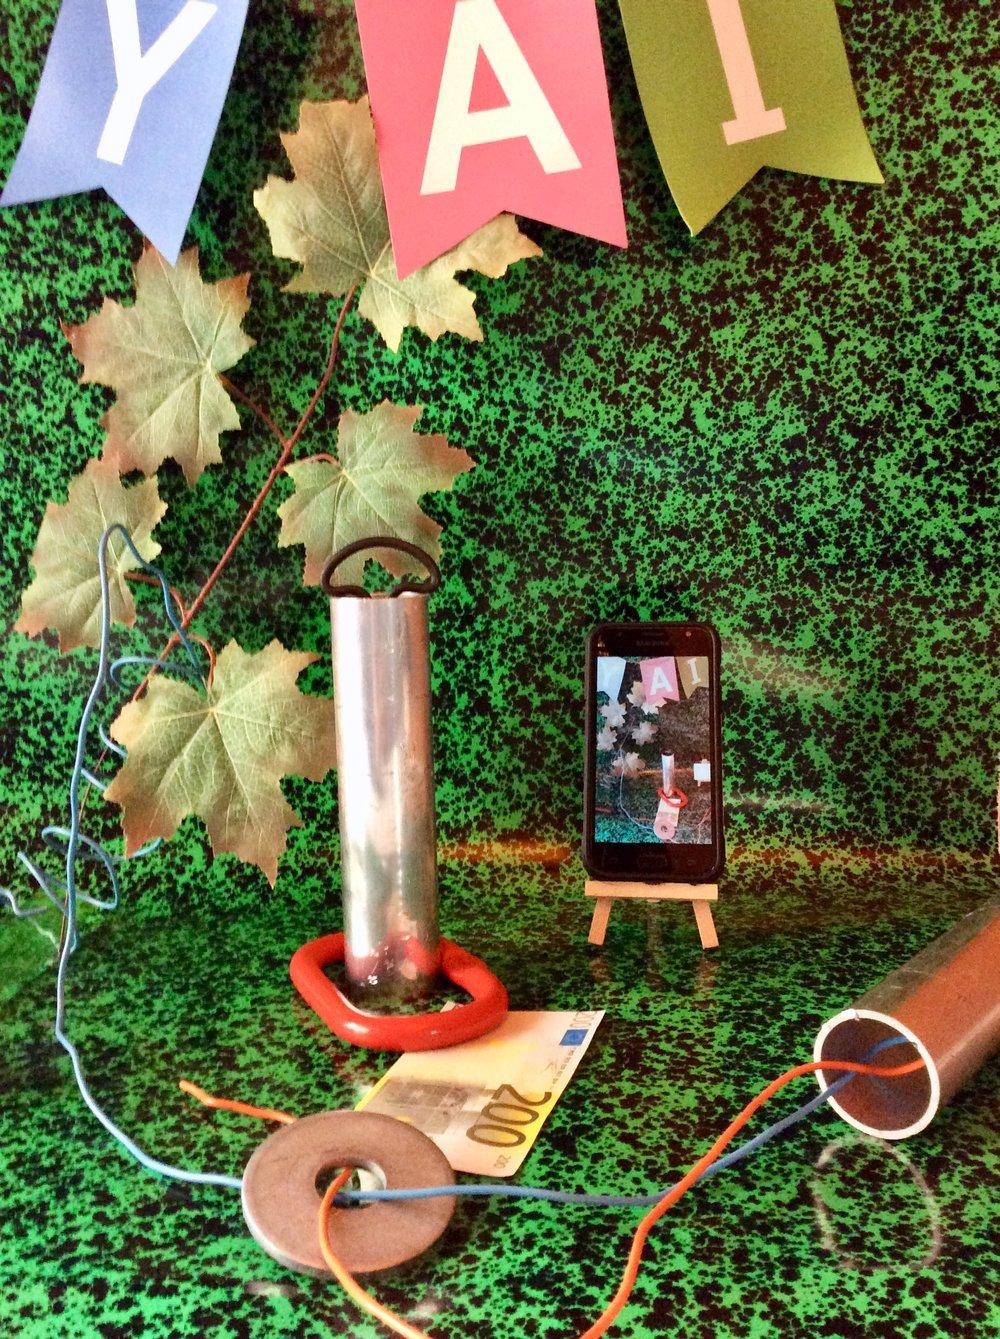 2ab-KunstWorkshop-189-001.jpg